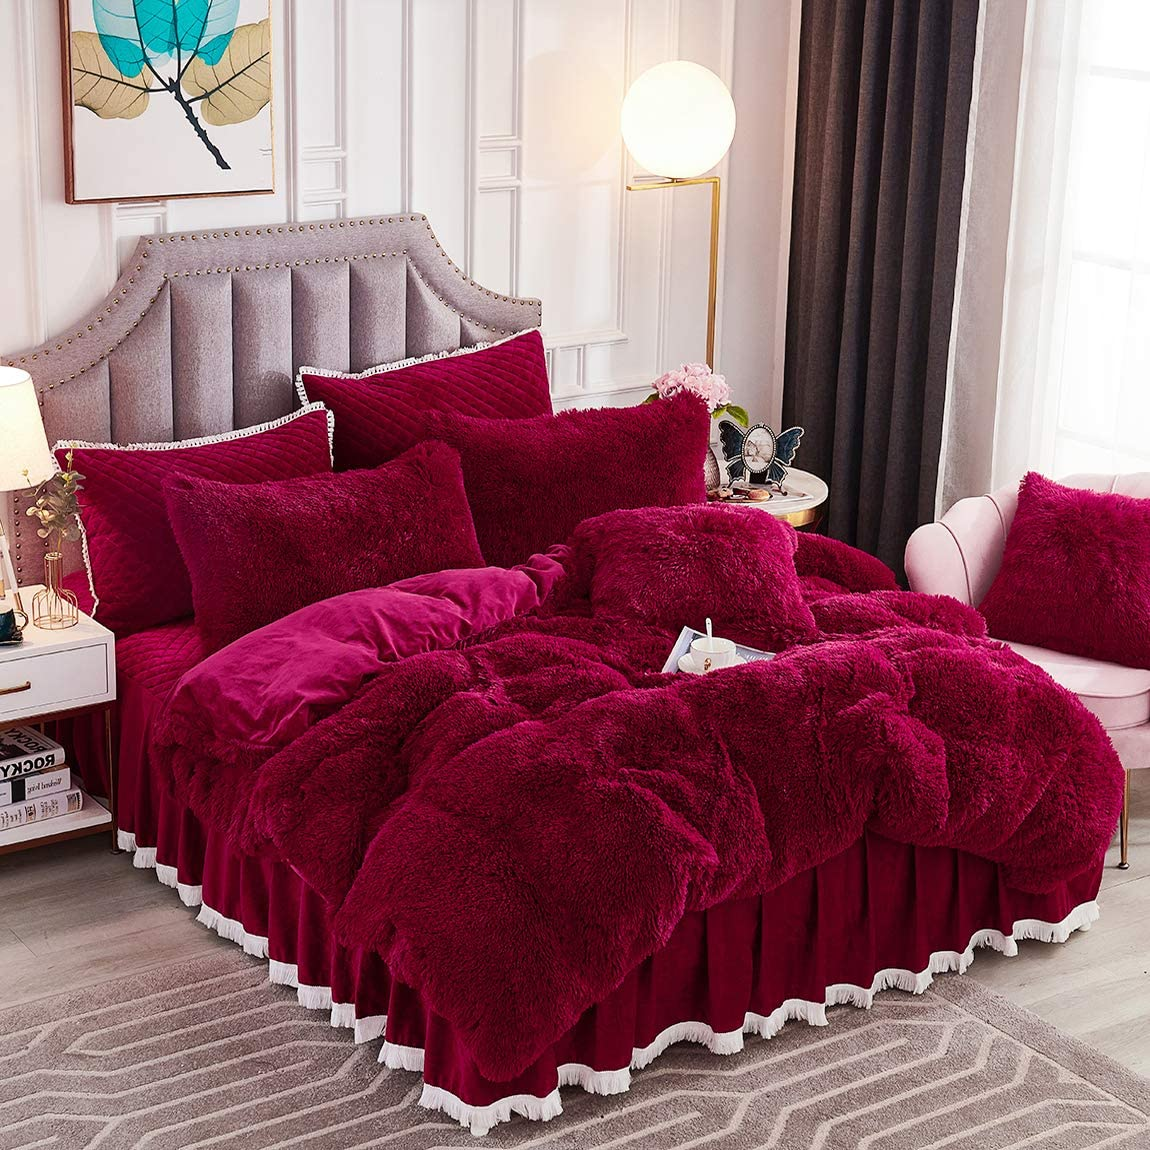 JAUXIO Luxury Long Faux Fur 3 PCS Bedding Set Shaggy Comforter Duvet Cover with Pillow Shams Ultra Soft Crystal Velvet Reverse (Queen, Burgundy)